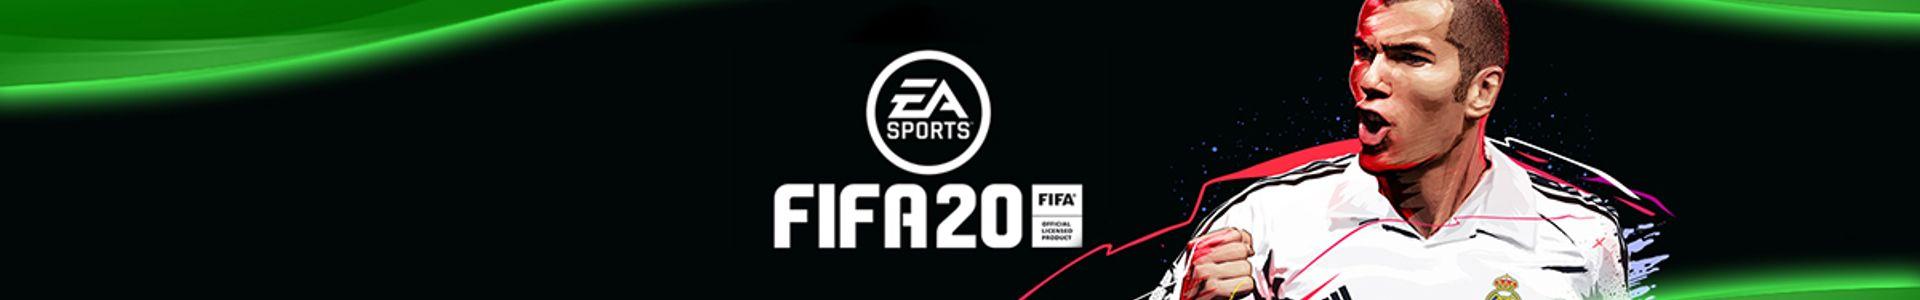 FIFA 20 FUT Points Xbox One